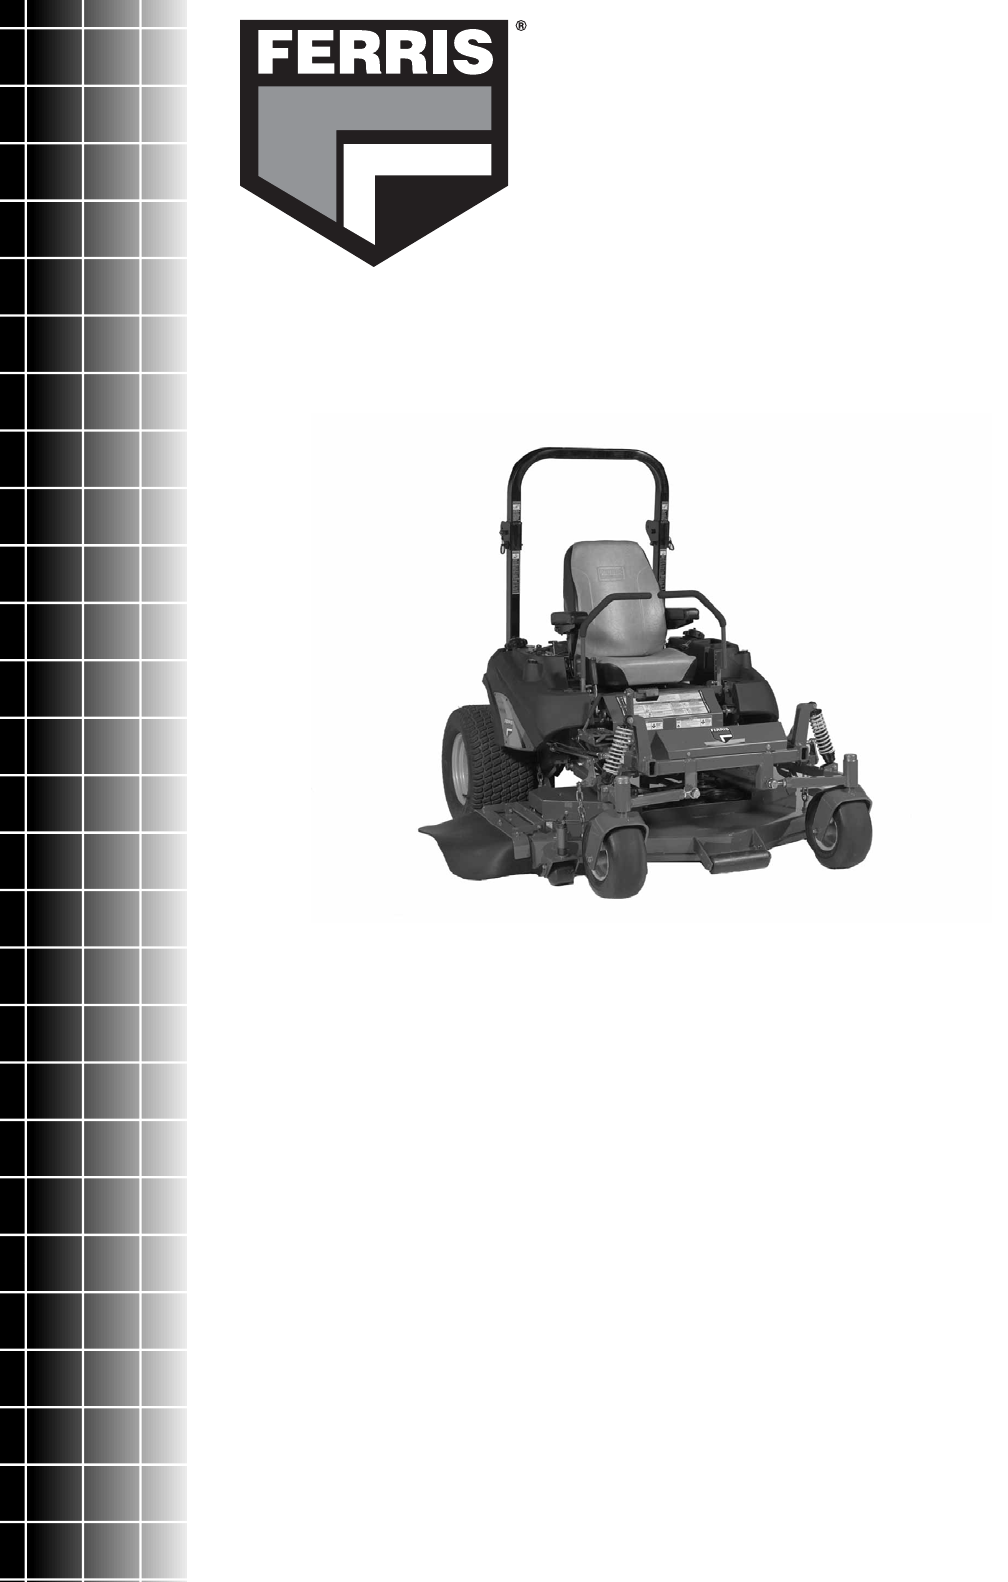 WRG-5568] Ferris Mower Wiring Diagram